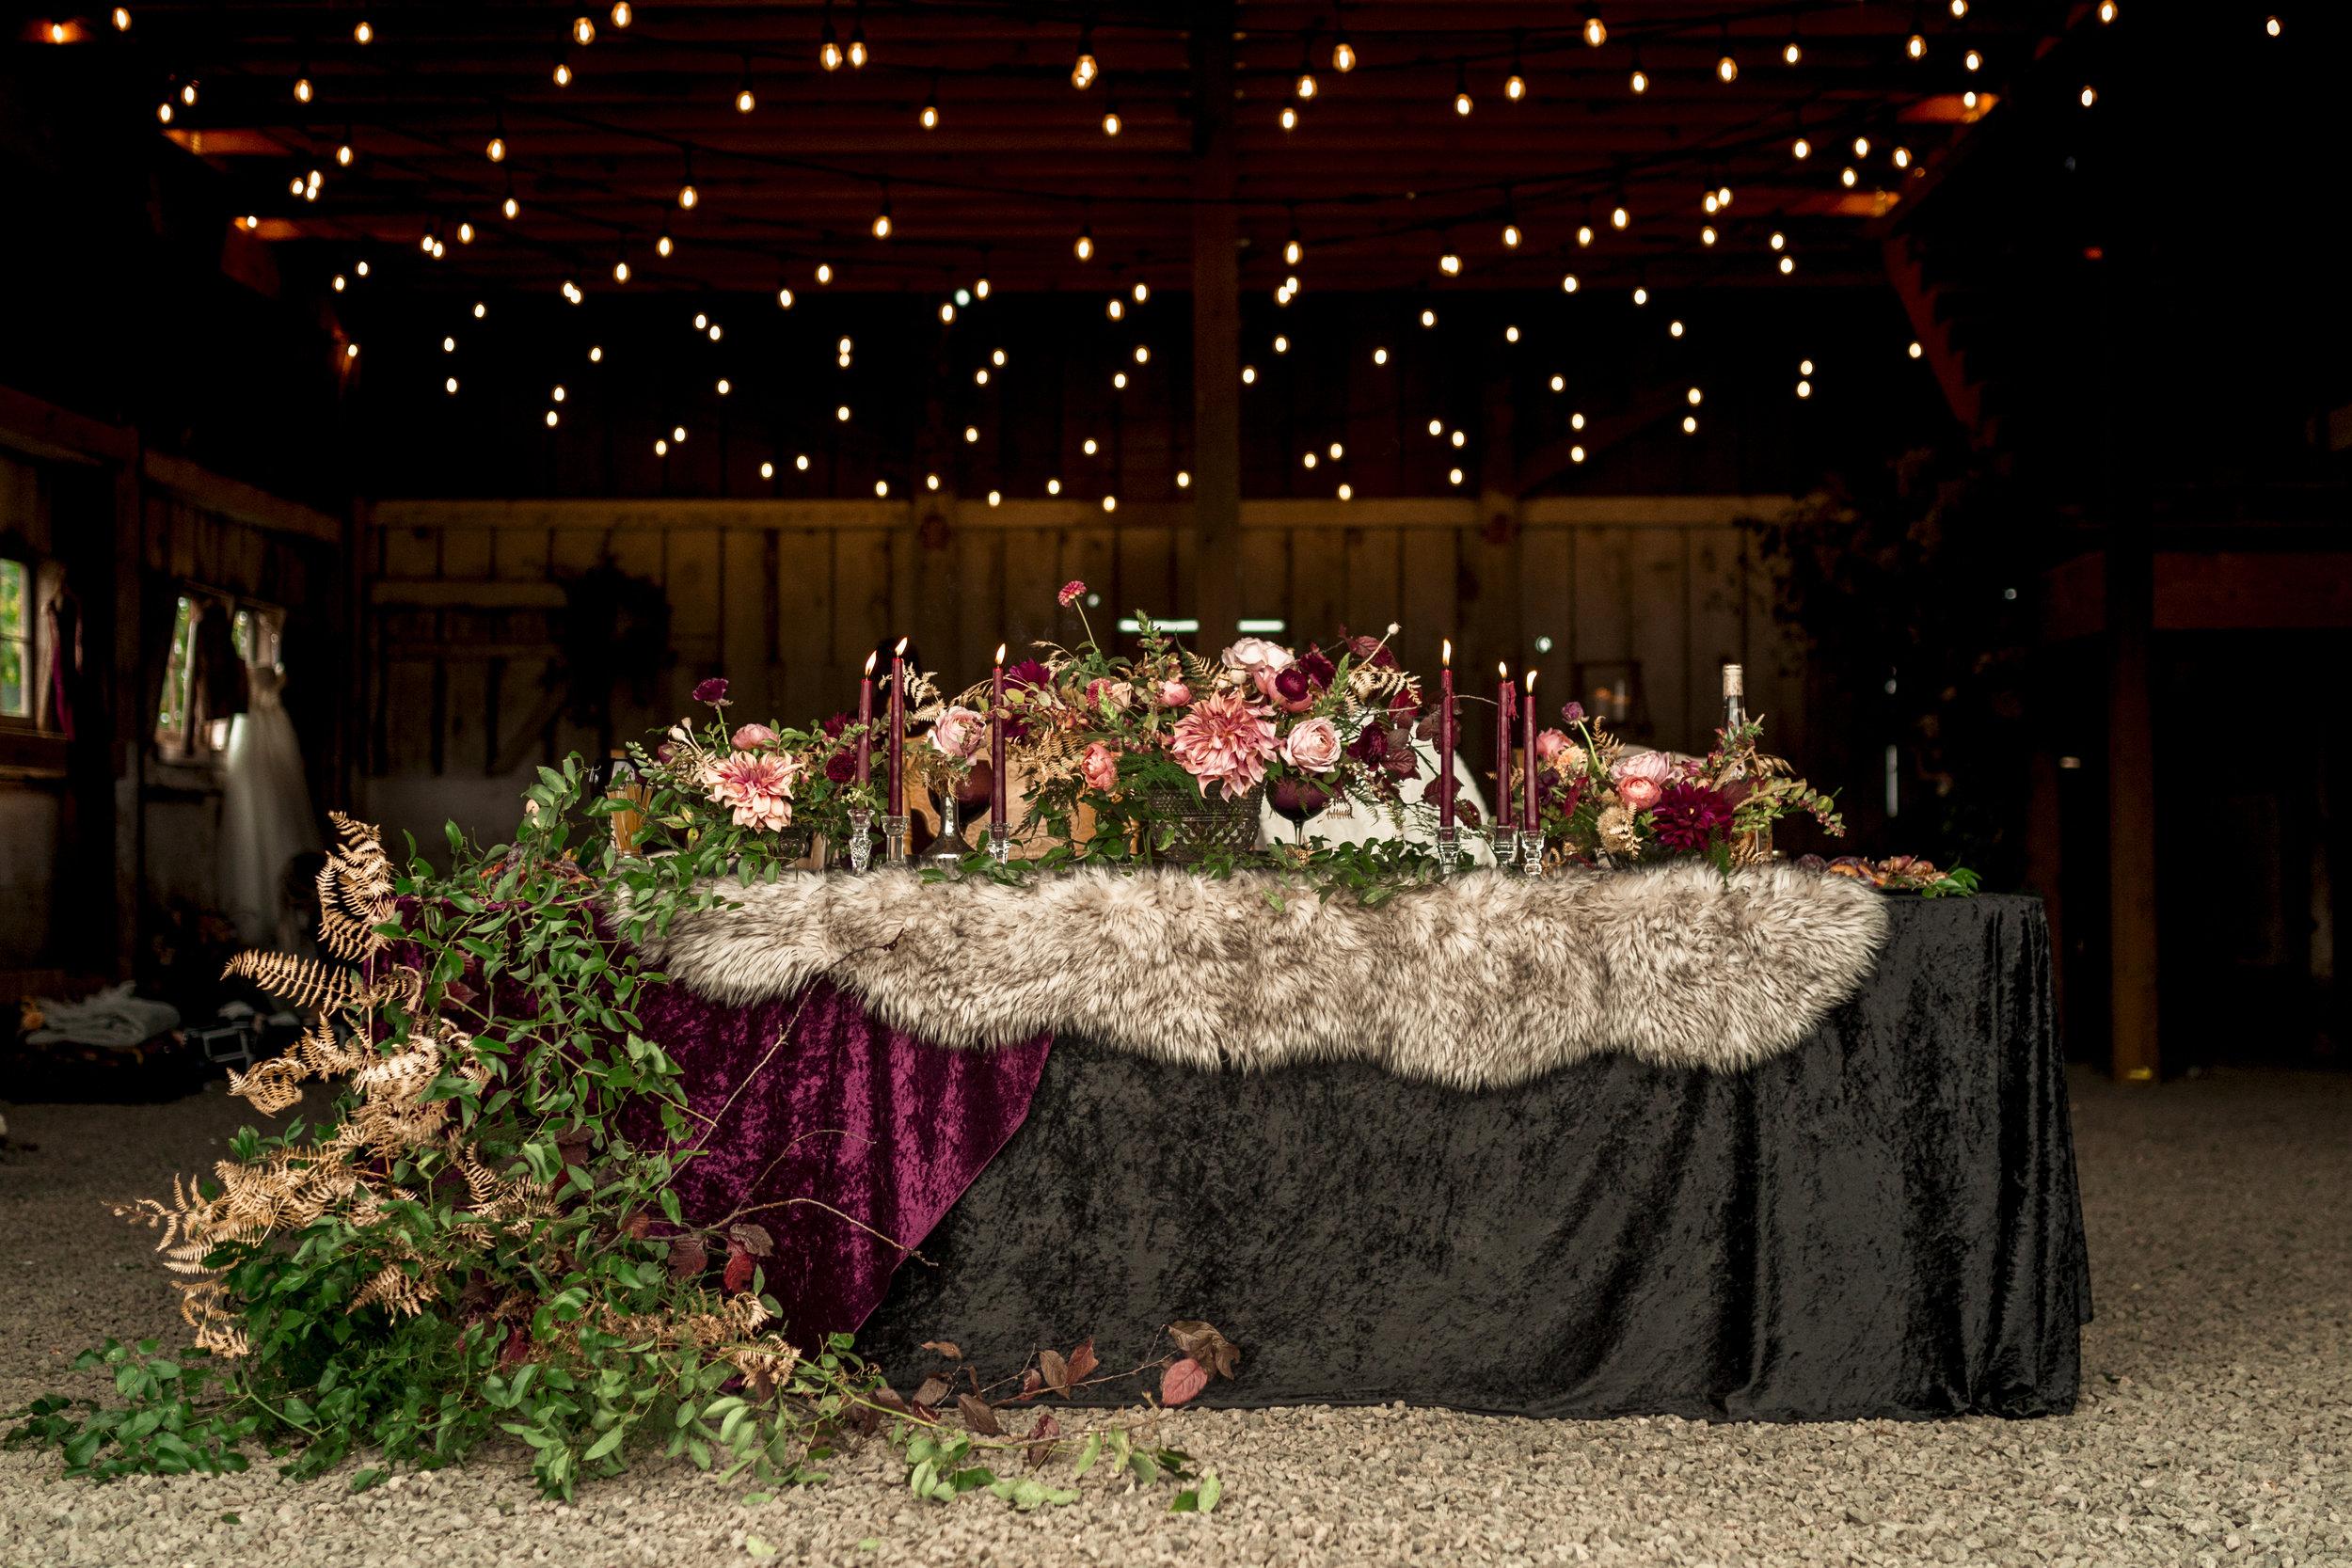 PNW Elopement | Forest Grove, Oregon | Bri Bergman Photography 007.JPG